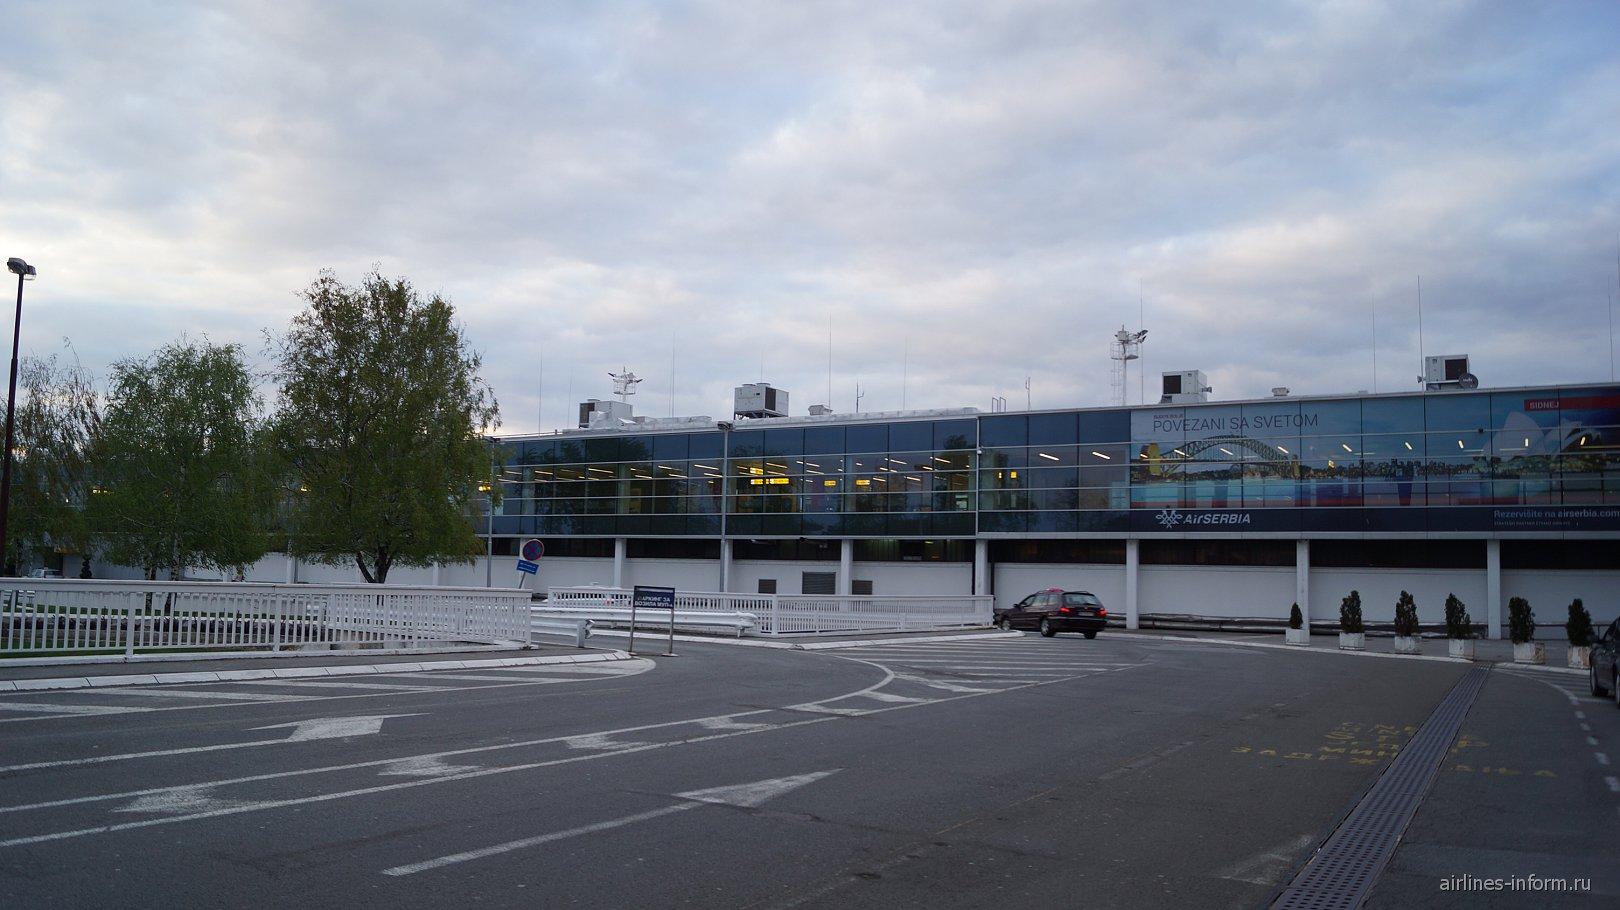 Сектор C терминала 2 аэропорта Белград Никола Тесла